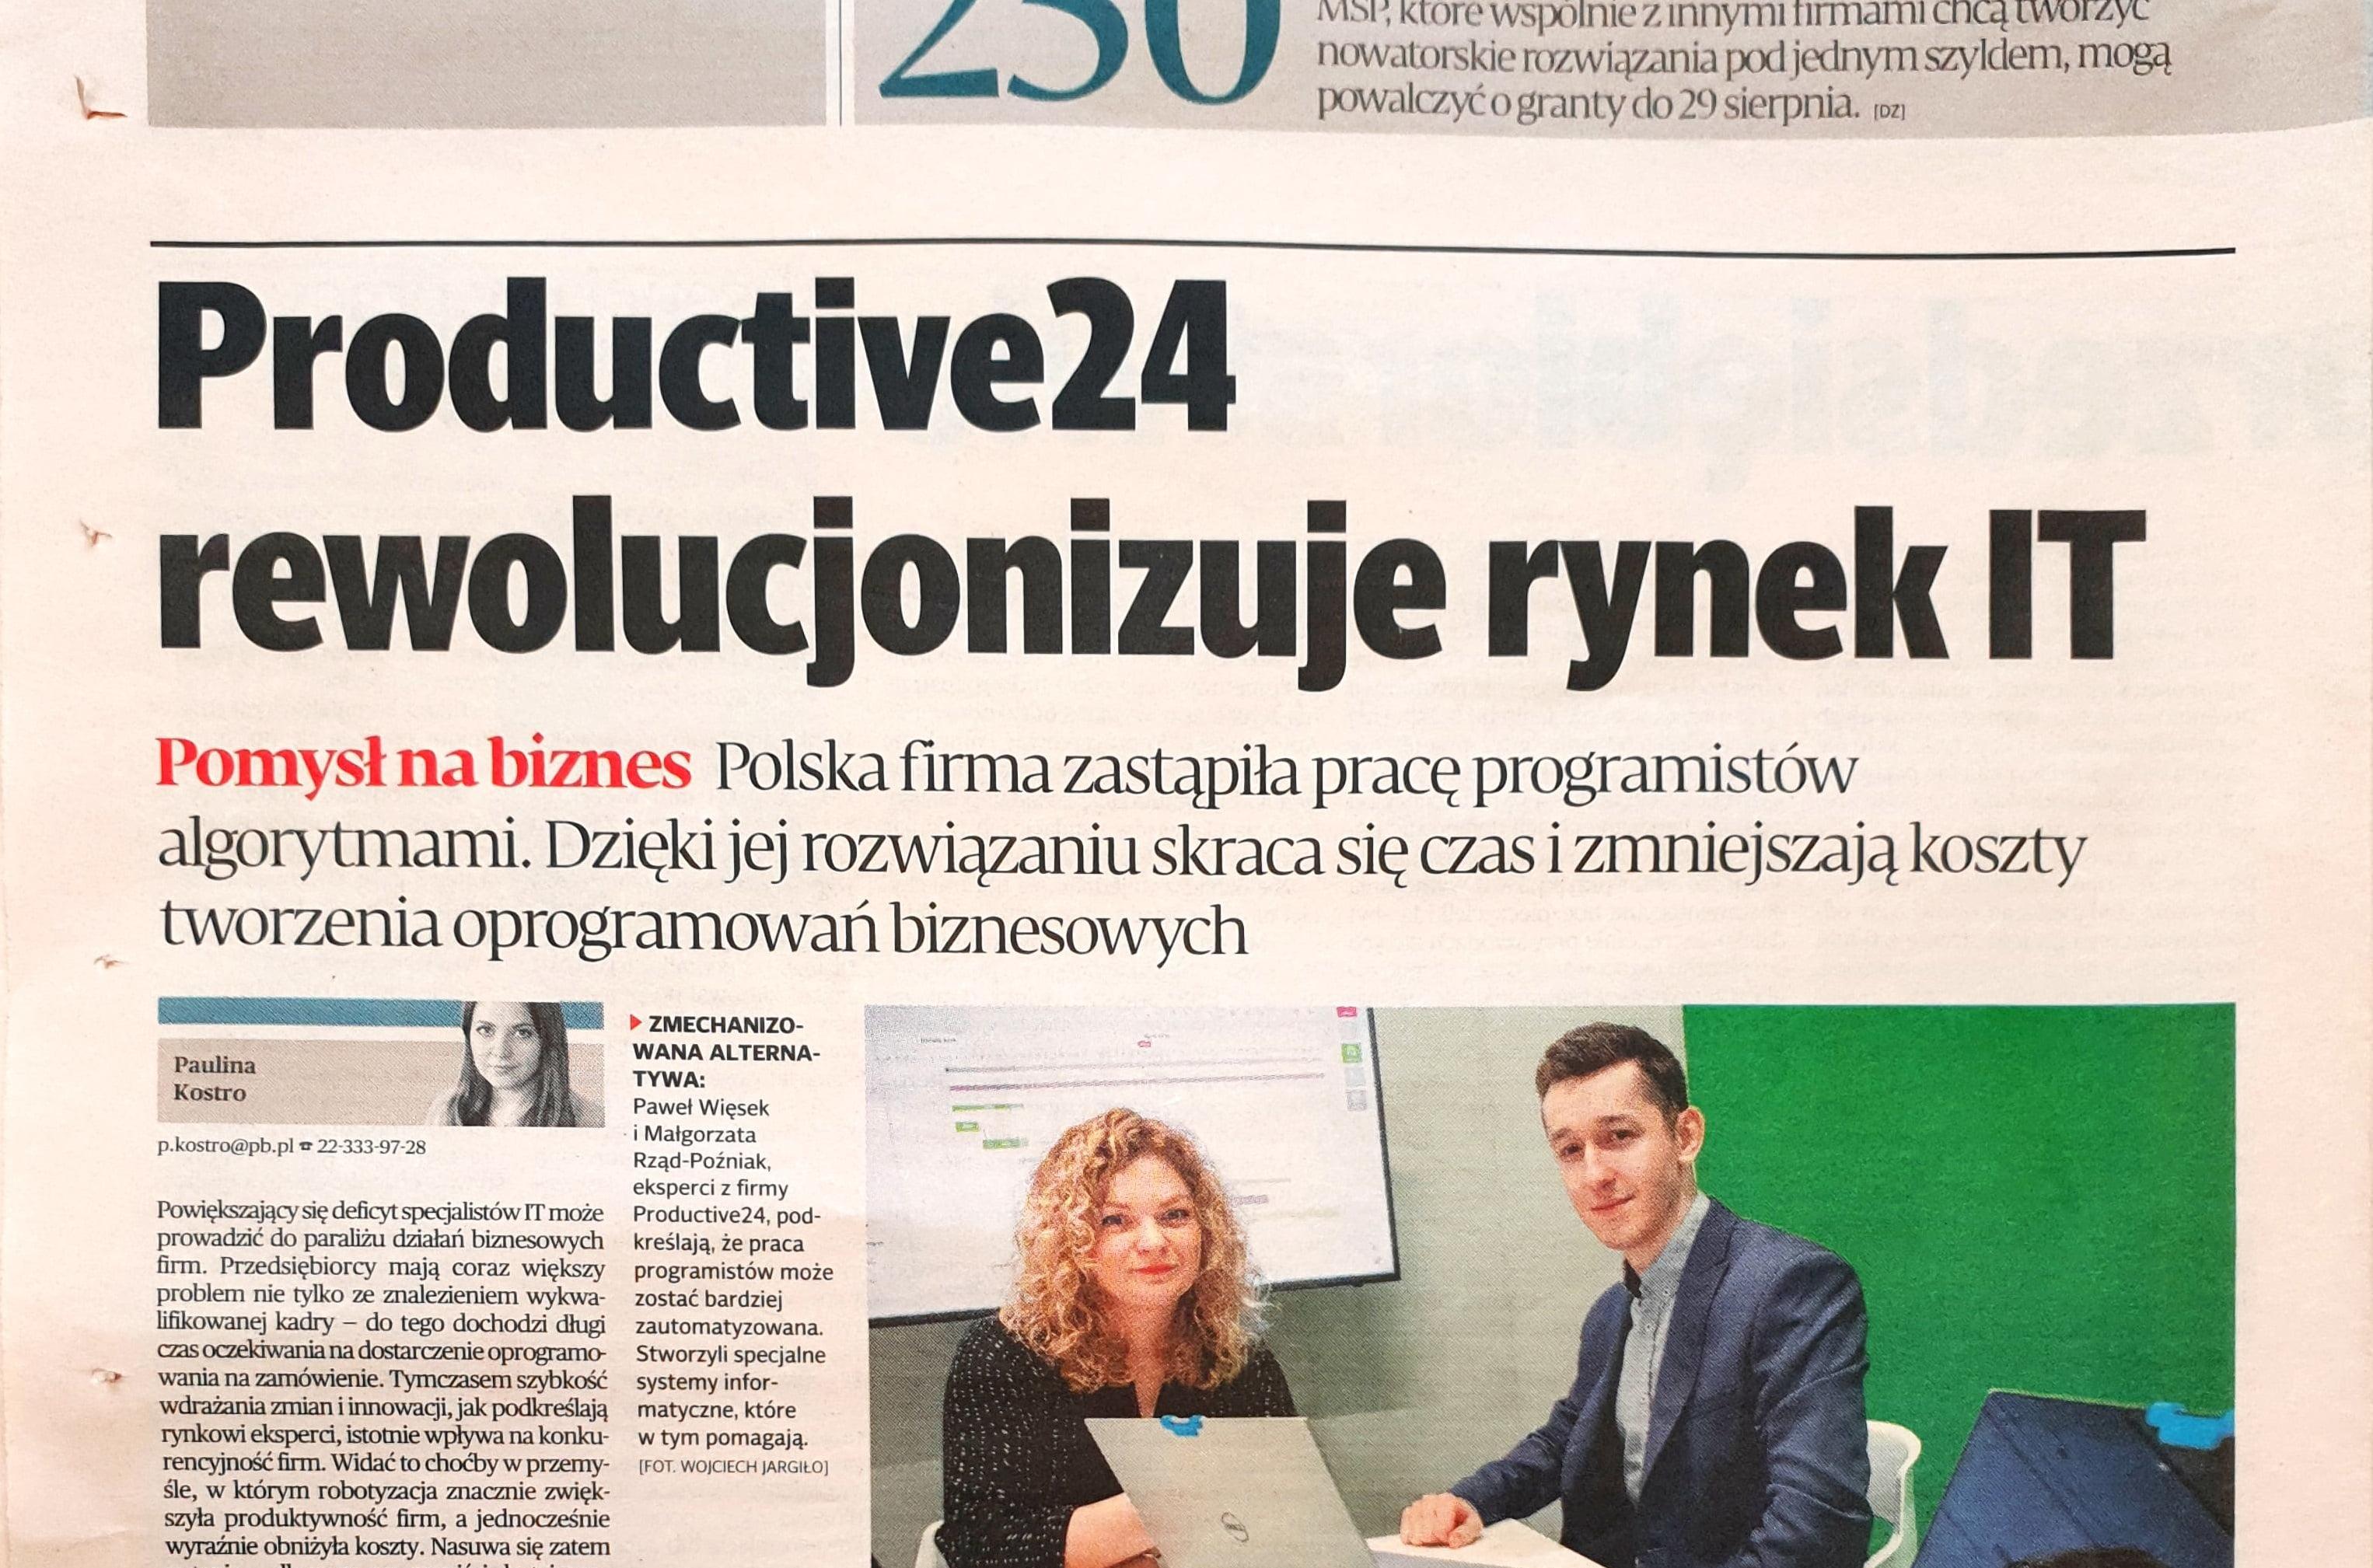 """Productive24 rewolucjonizuje rynek IT"""